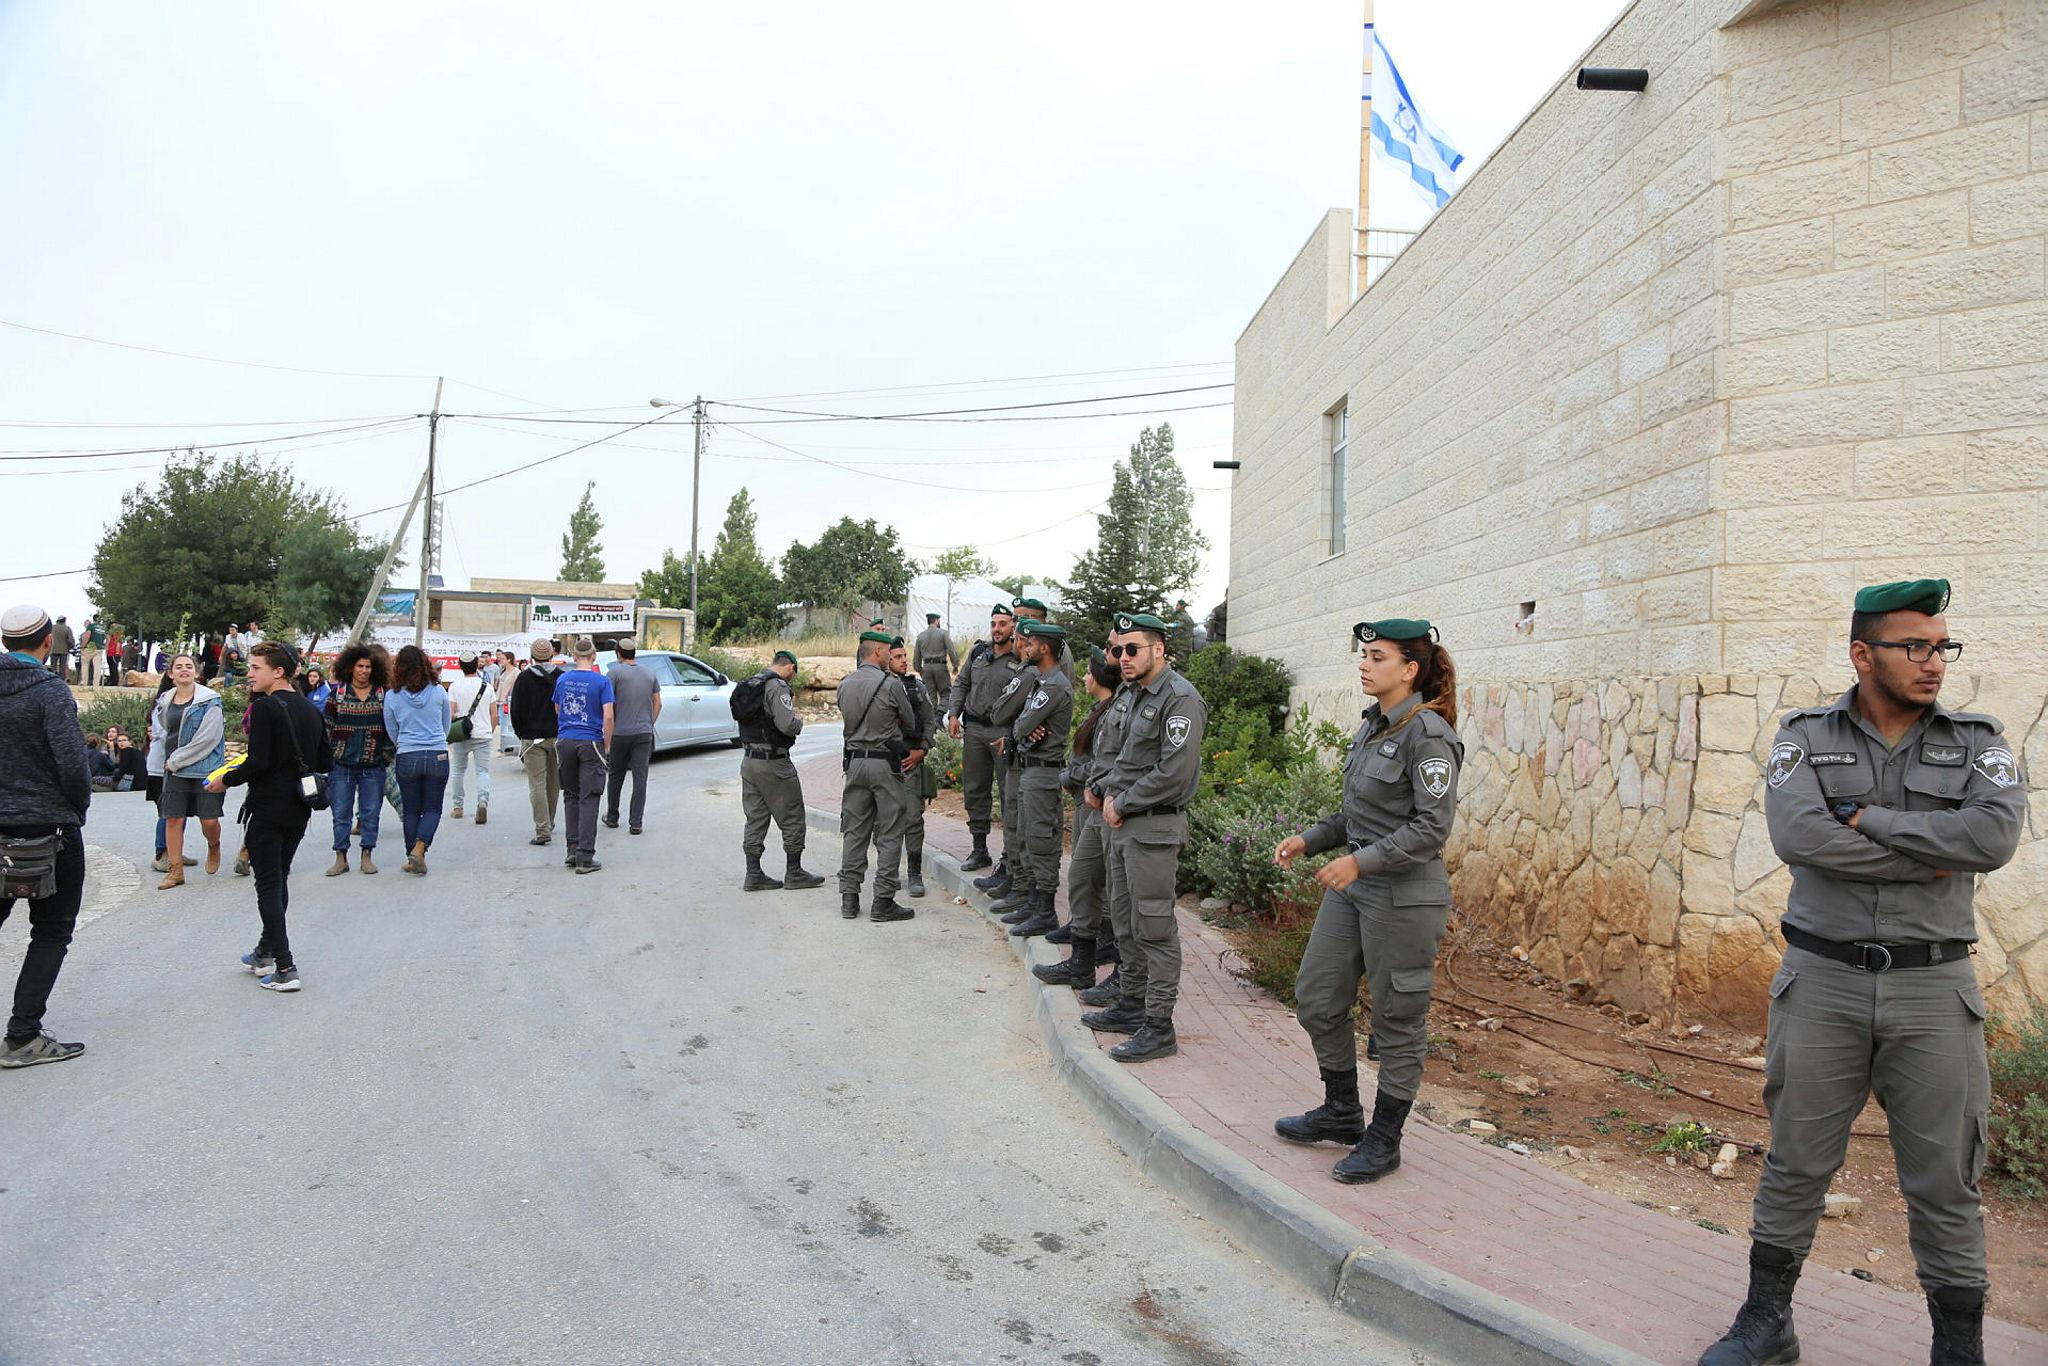 Eviction at Netiv Avot neighborhood in El'azar